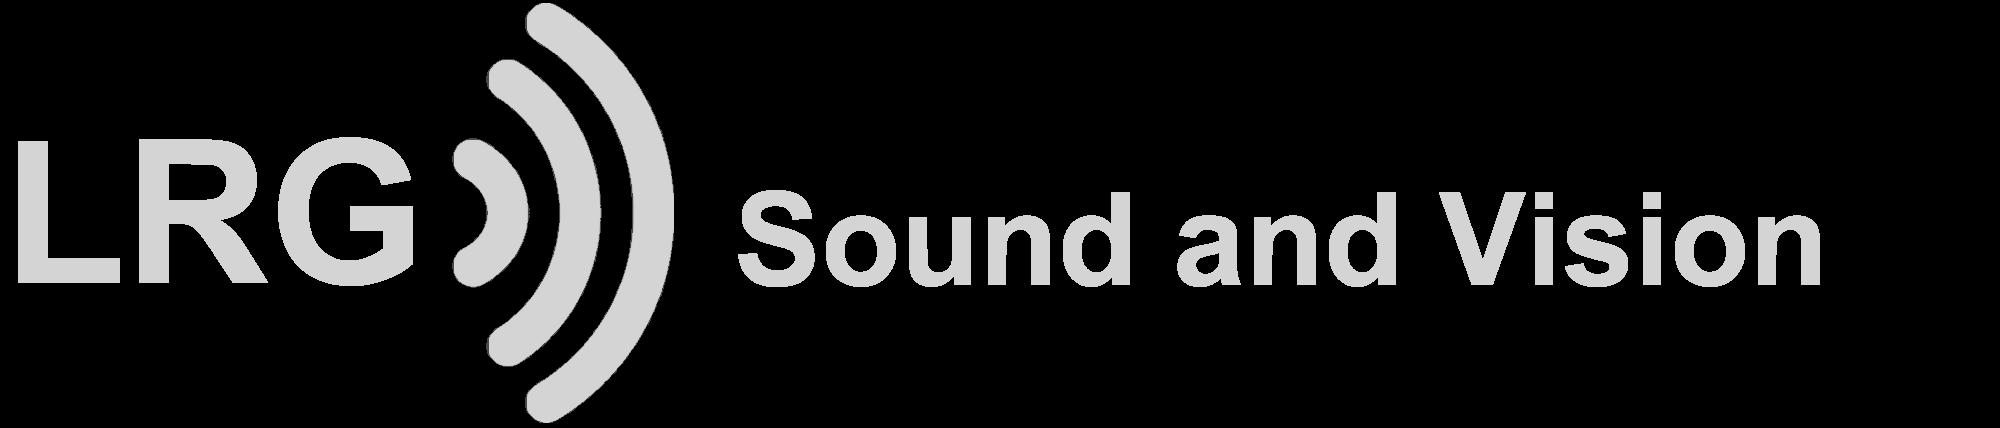 filestore/images/logos/lrg-sound-vision-logo.png